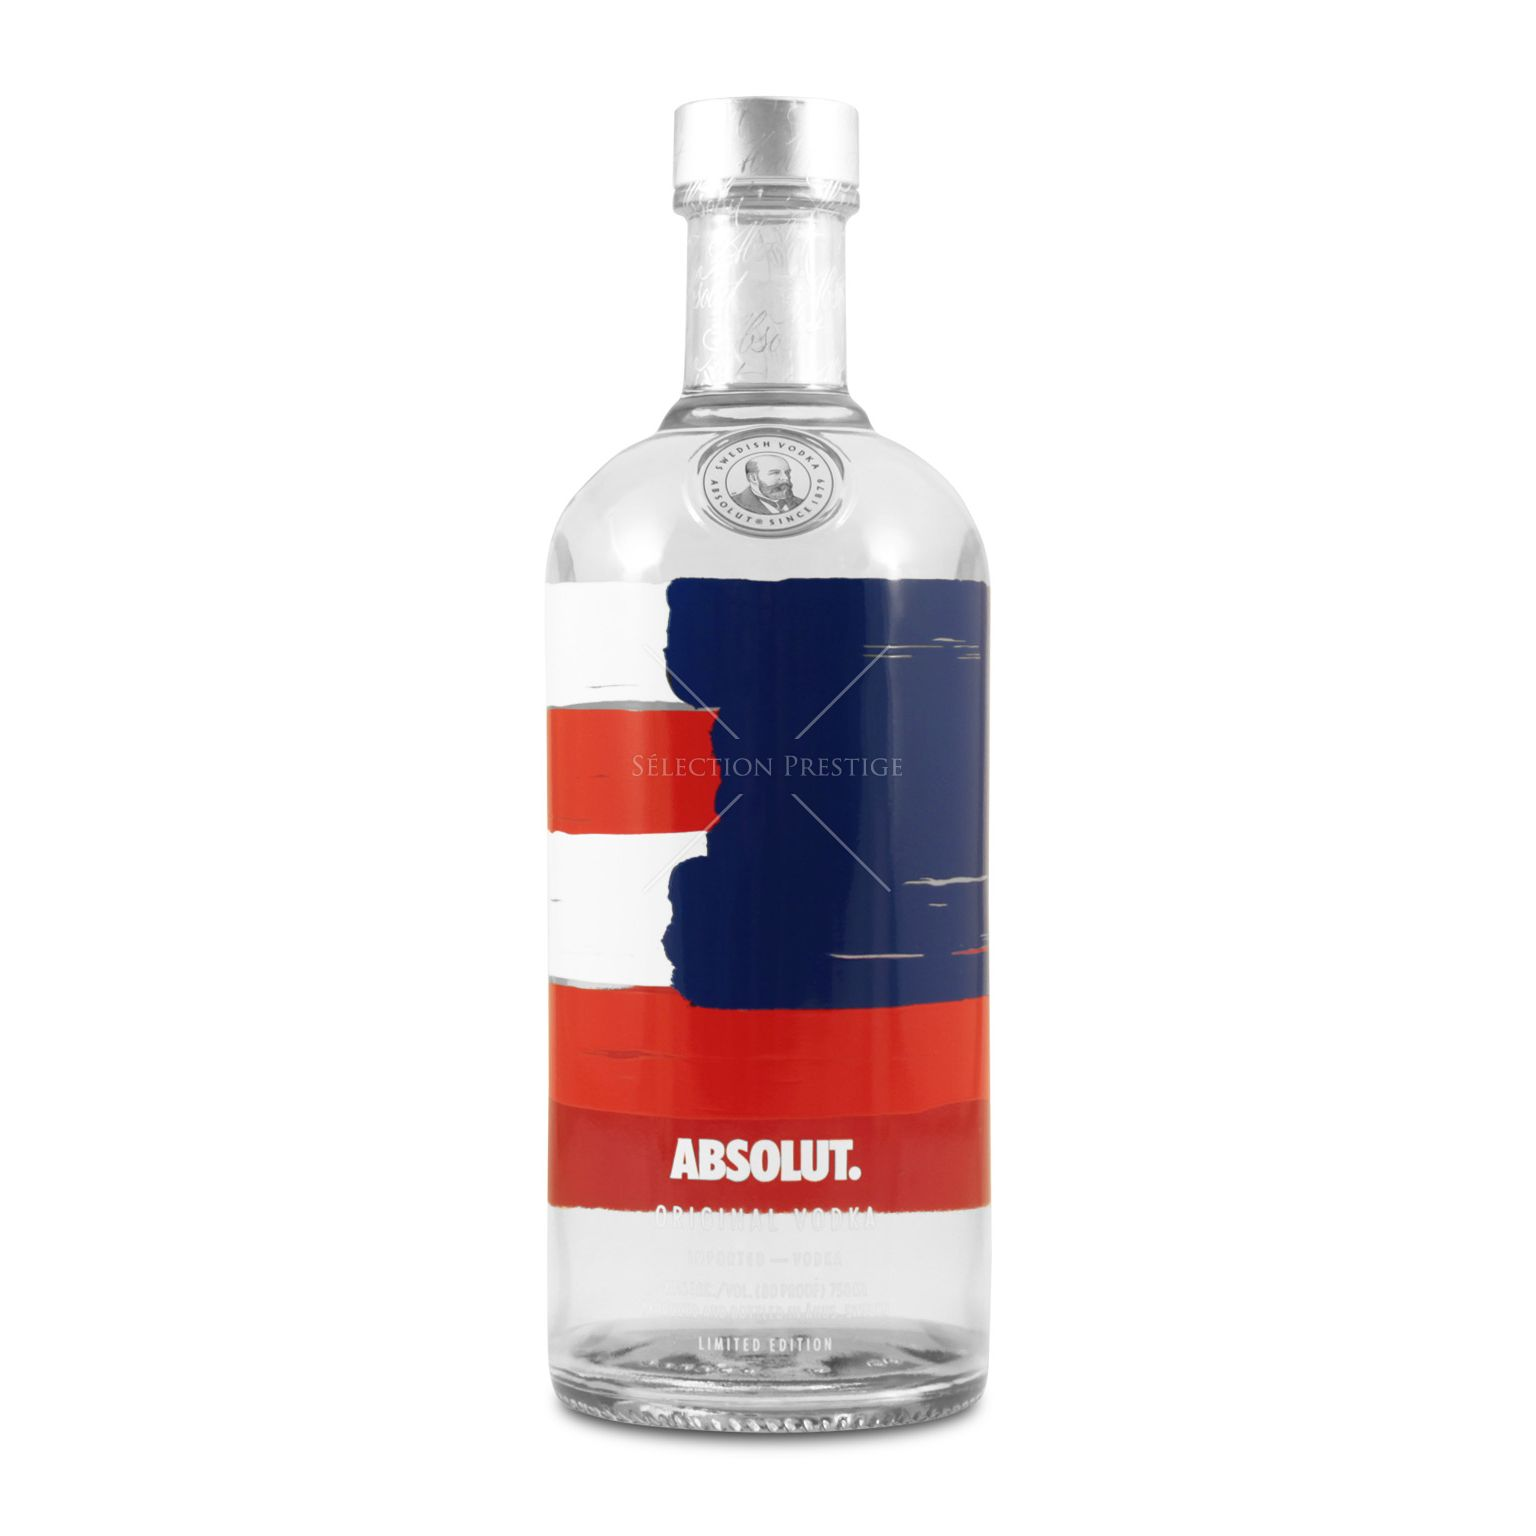 Wonderbaarlijk Absolut Vodka Unity Limited Edition 0.7L (40% Vol.) - Absolut - Vodka SU-57